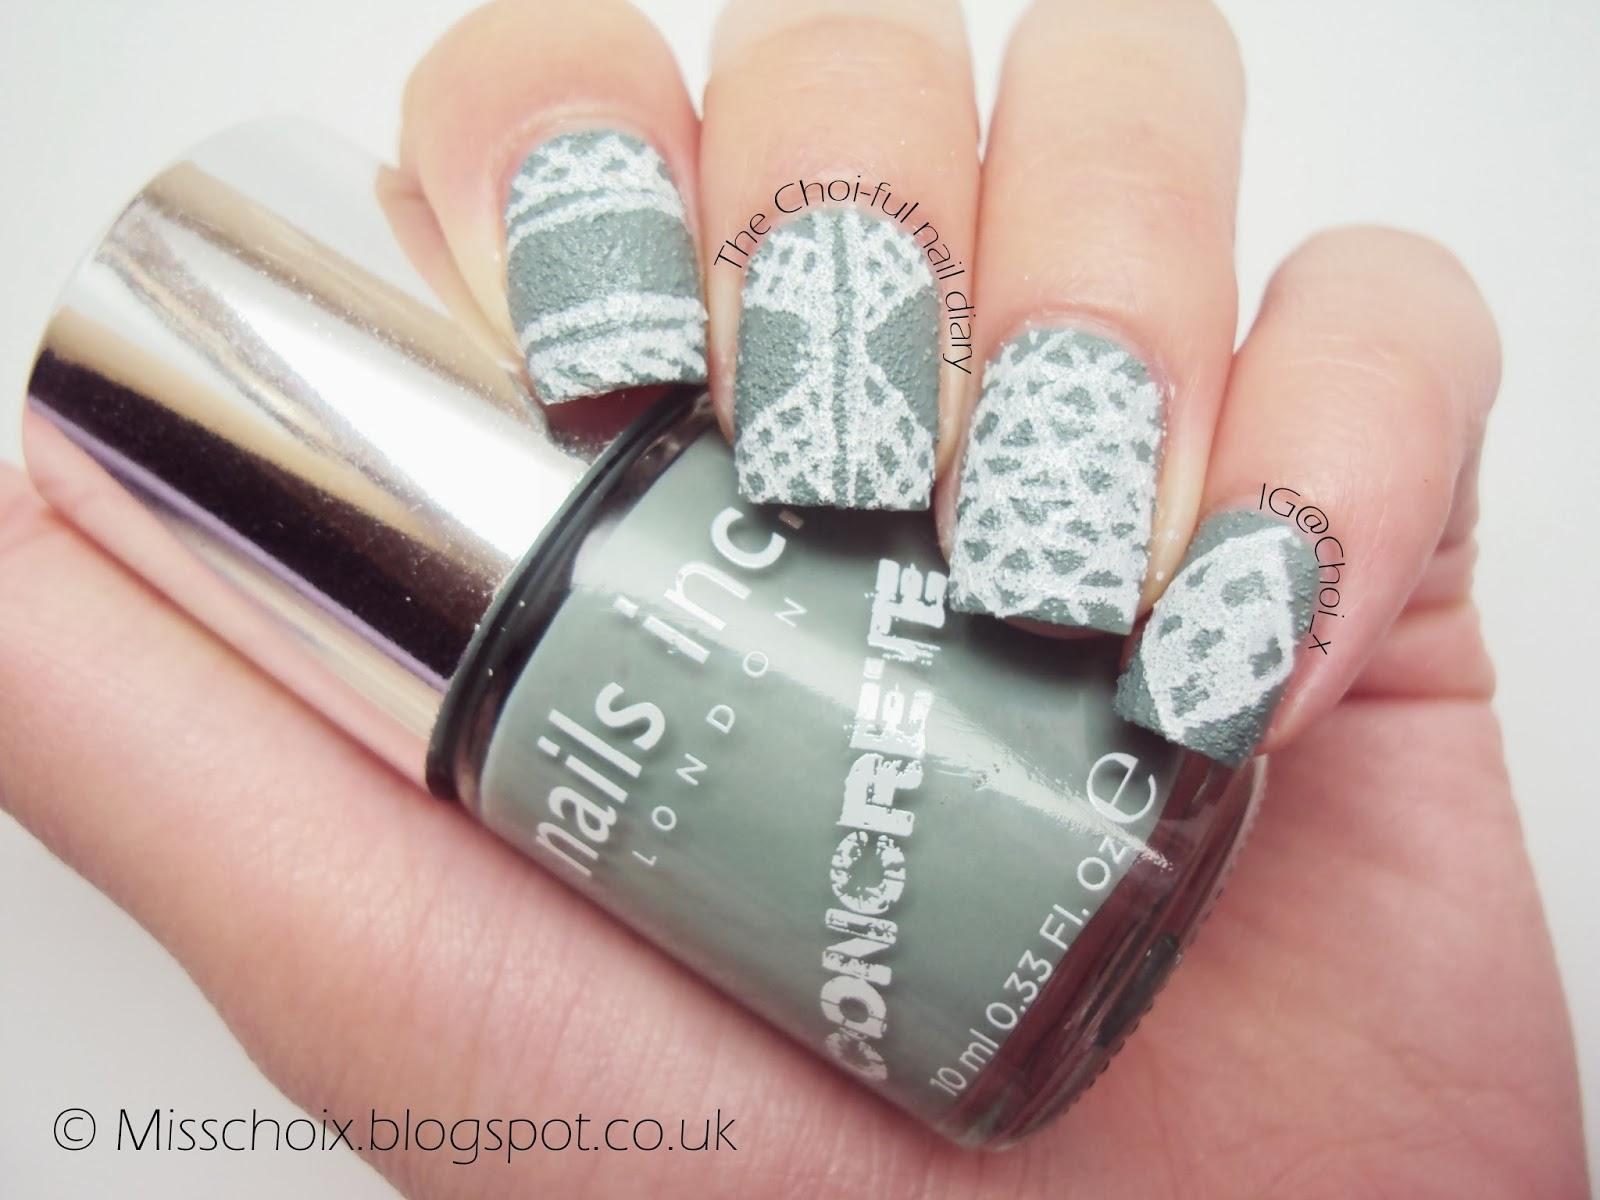 Nails Inc Barbican & some nail art doodling using Barry M - Choi\'s nails